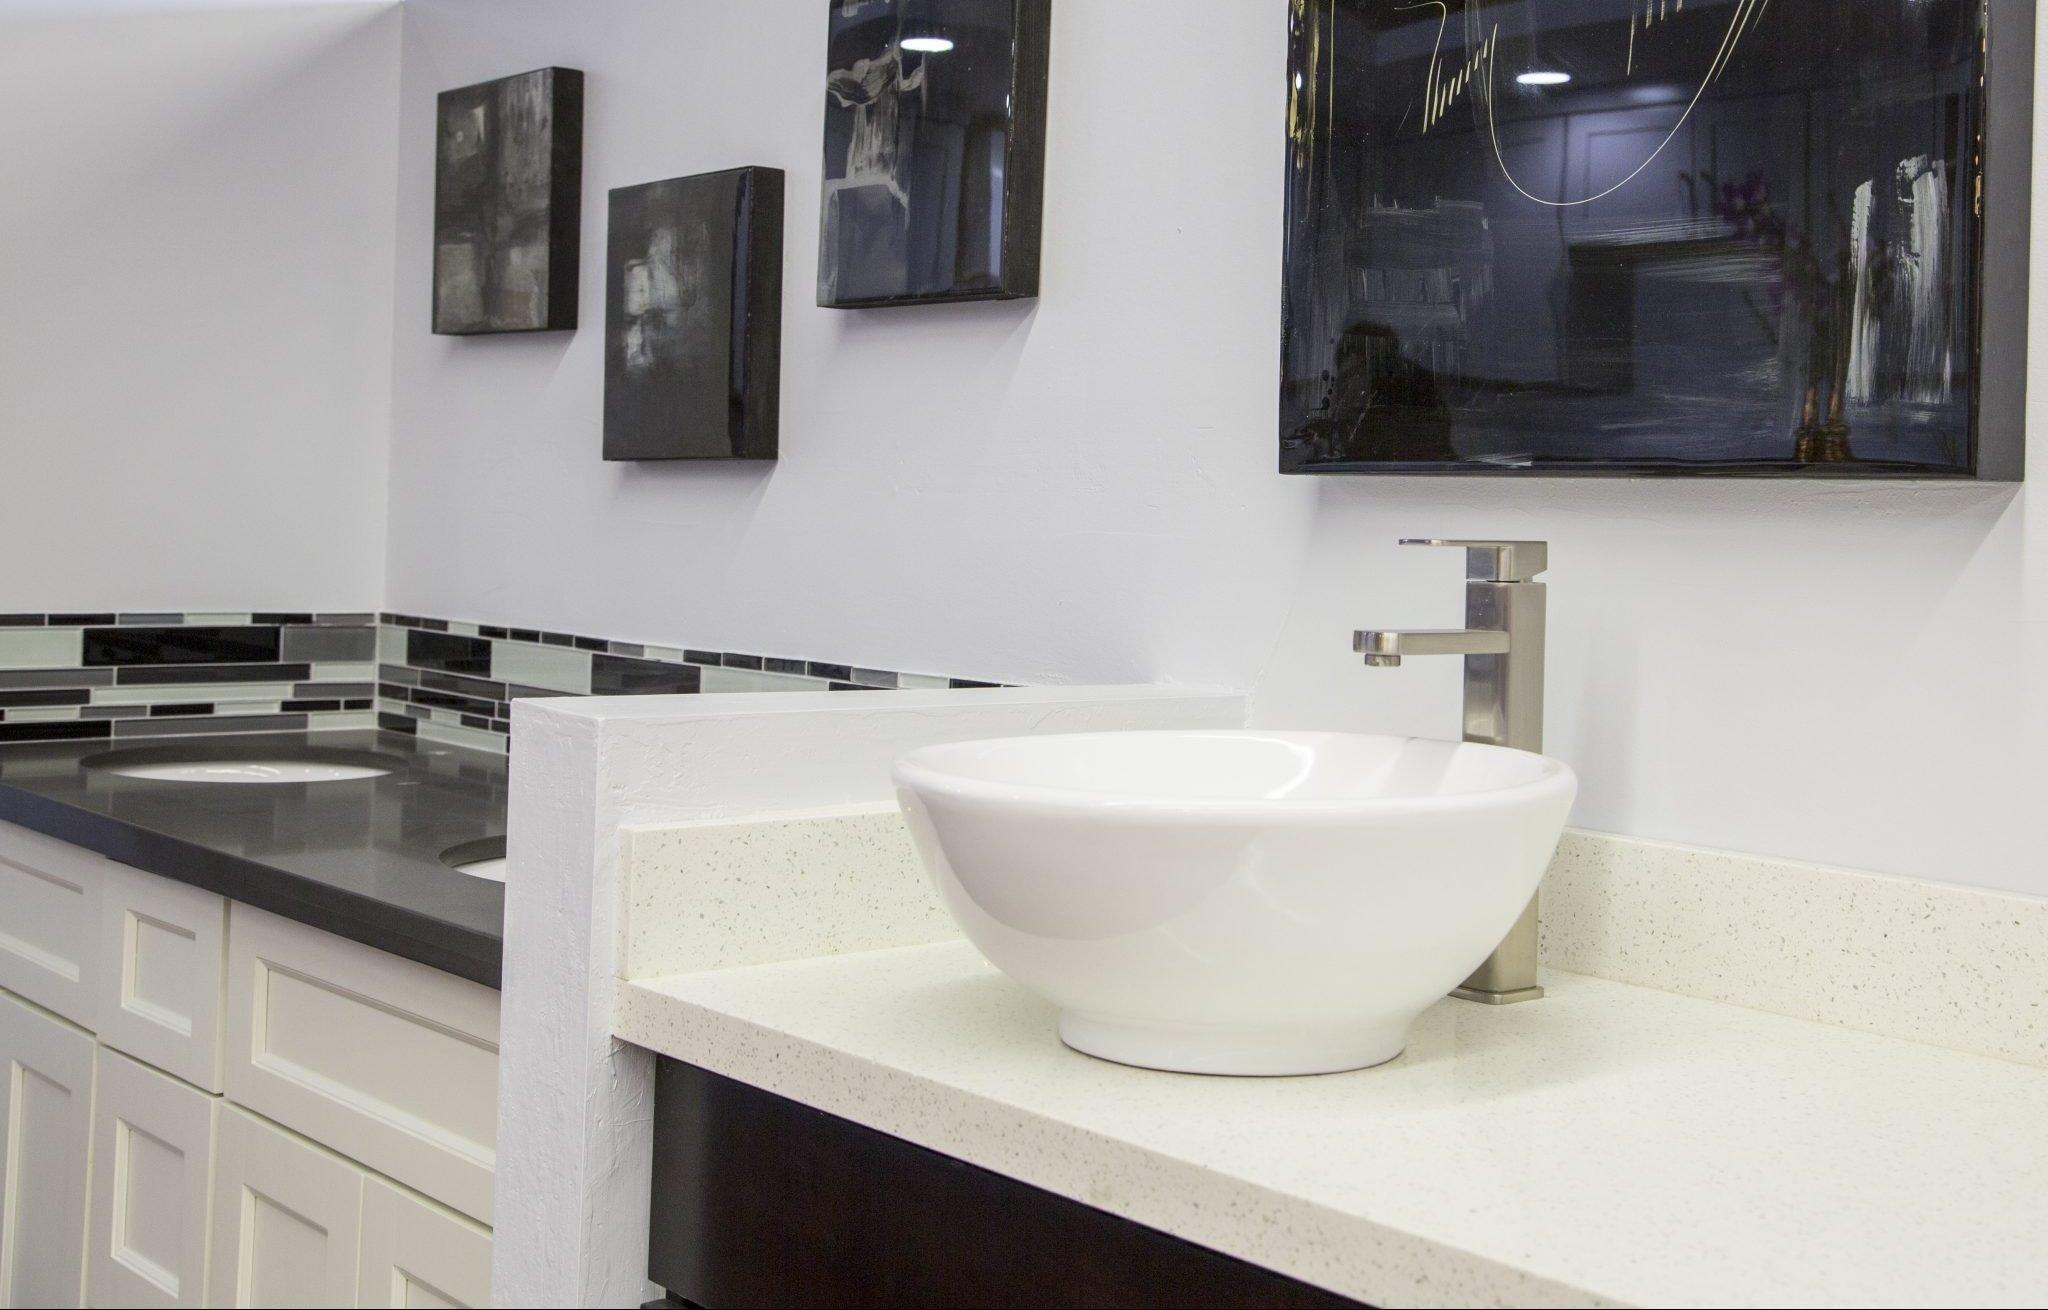 Various Bathroom Sink Styles Please Visit Our Showroom Abs Cabinets Counters Seattle Bellevue Lynnwood